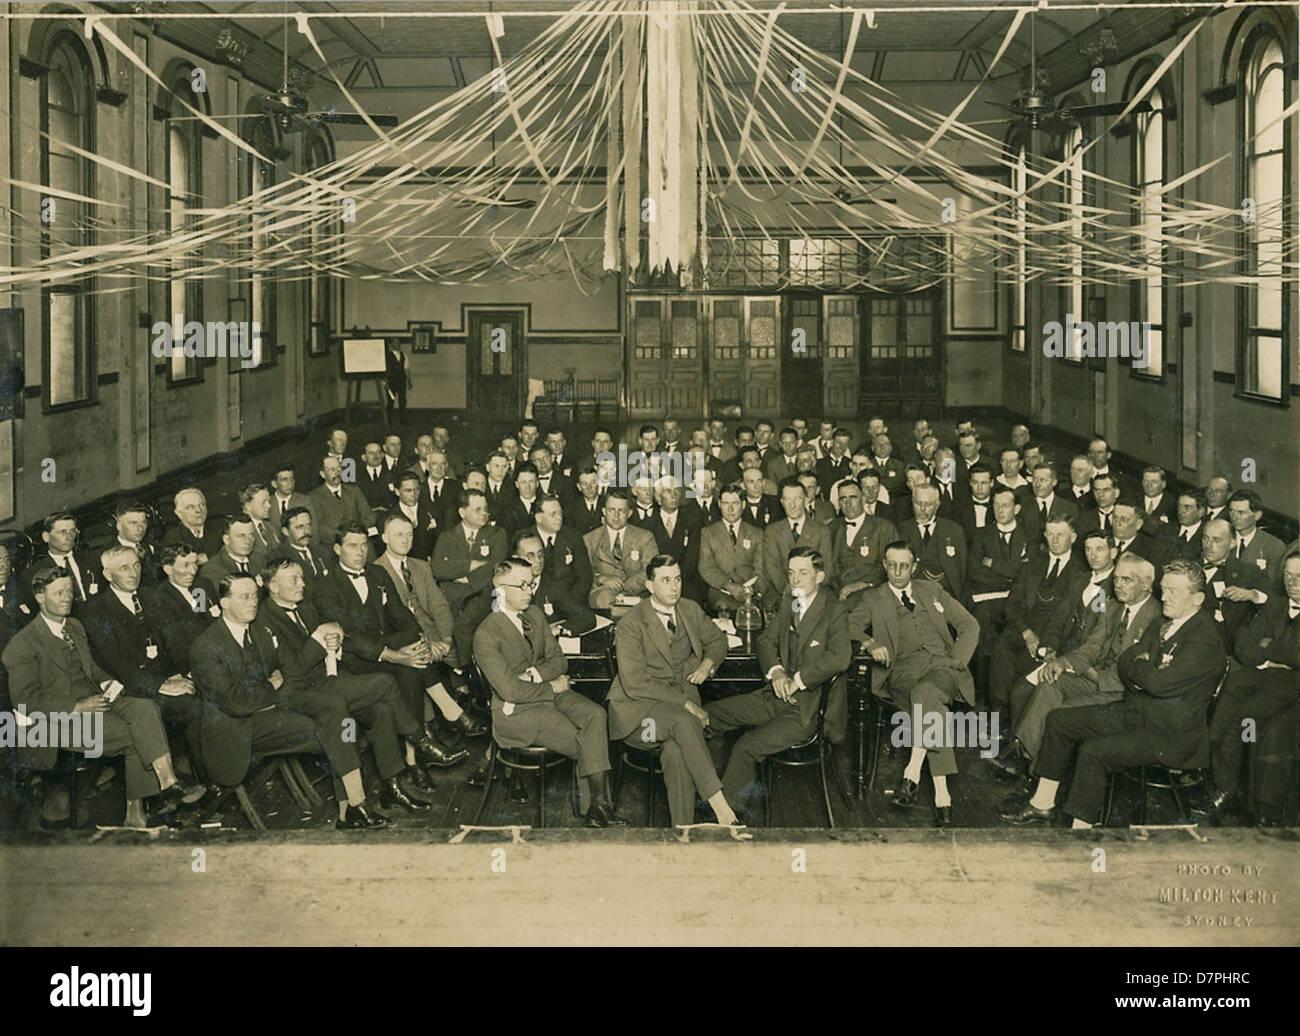 Large group of men at meeting, 1920 - 1929 - Stock Image